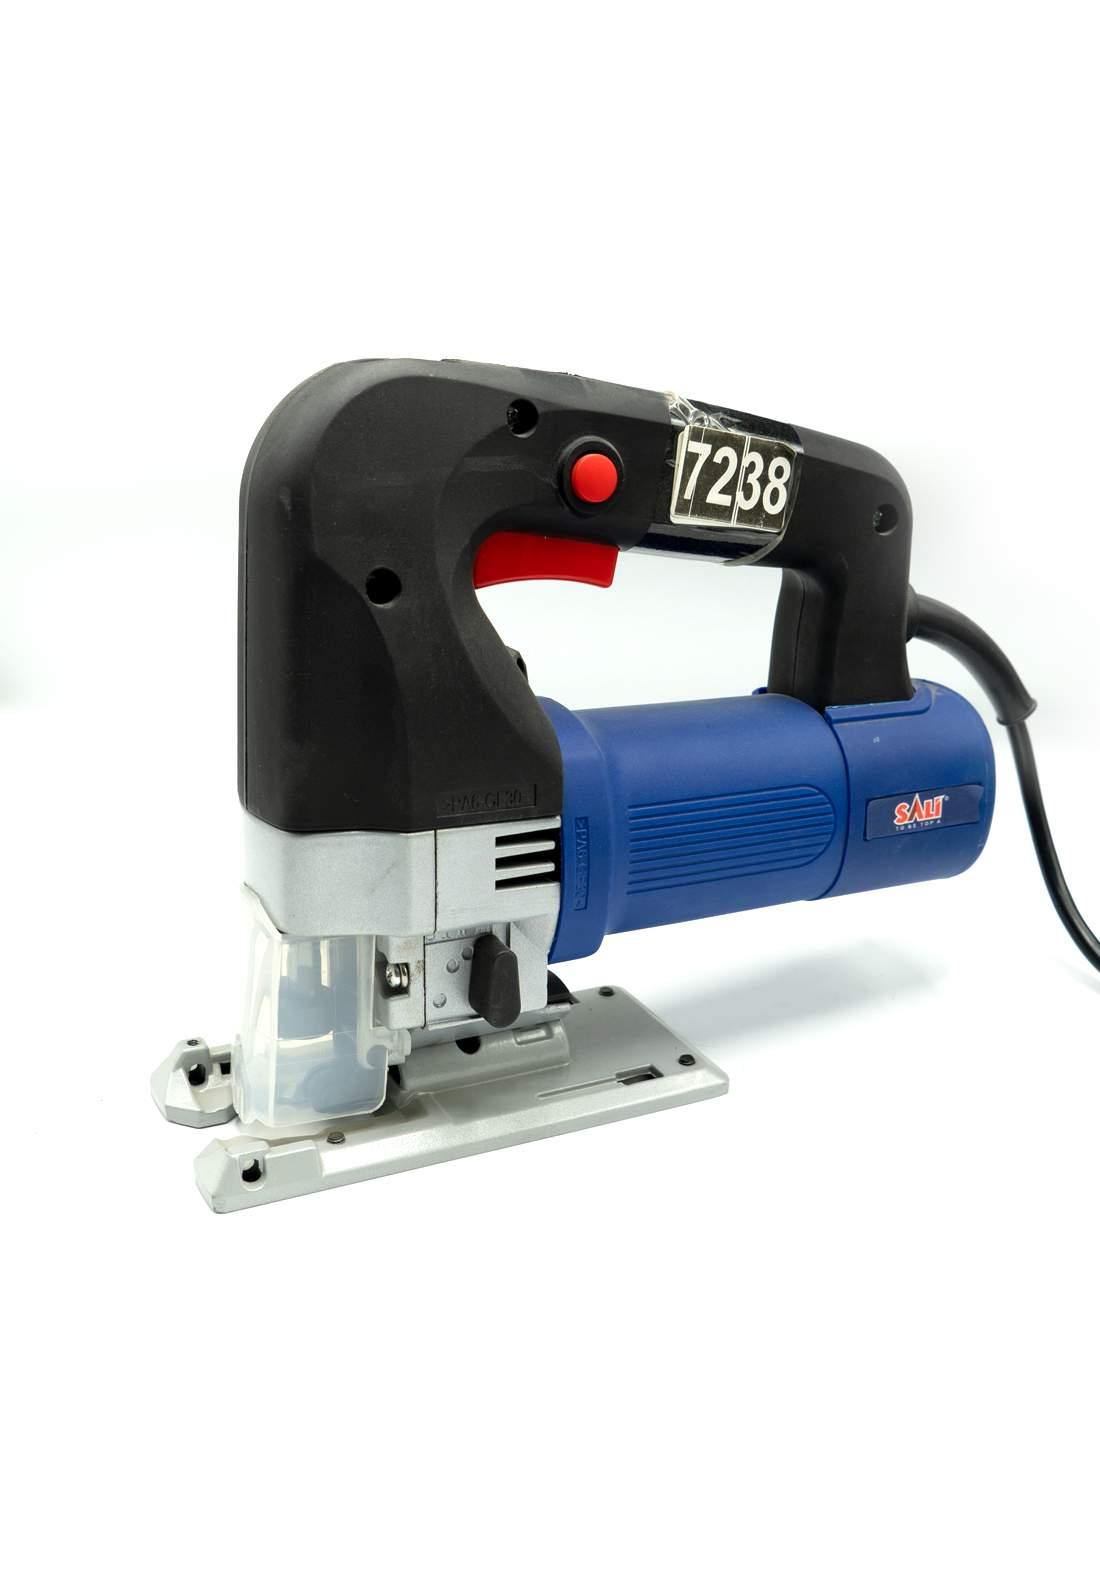 Sali 3565  High Quality Electric Jig Saw  600 W منشار تخريم منضدي